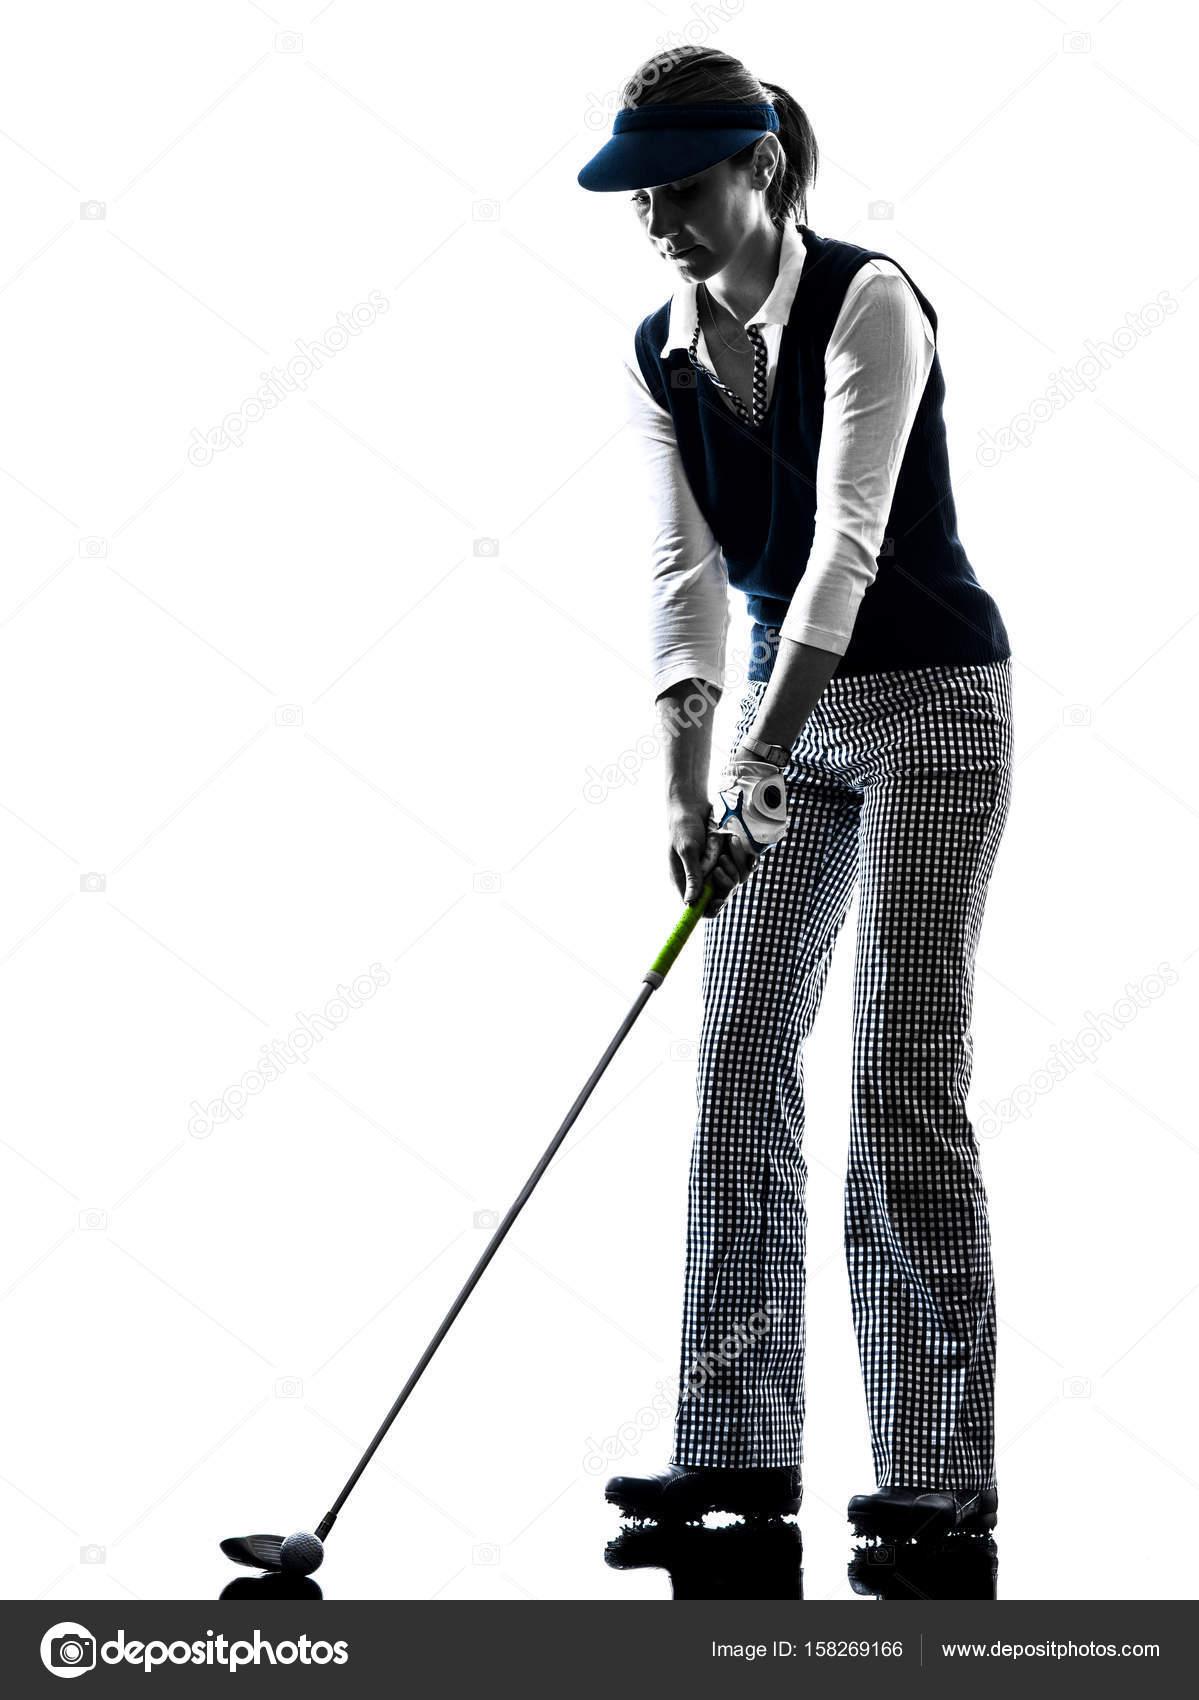 Golf Silhouette Frau Golfspieler Stockfoto C Stylepics 158269166